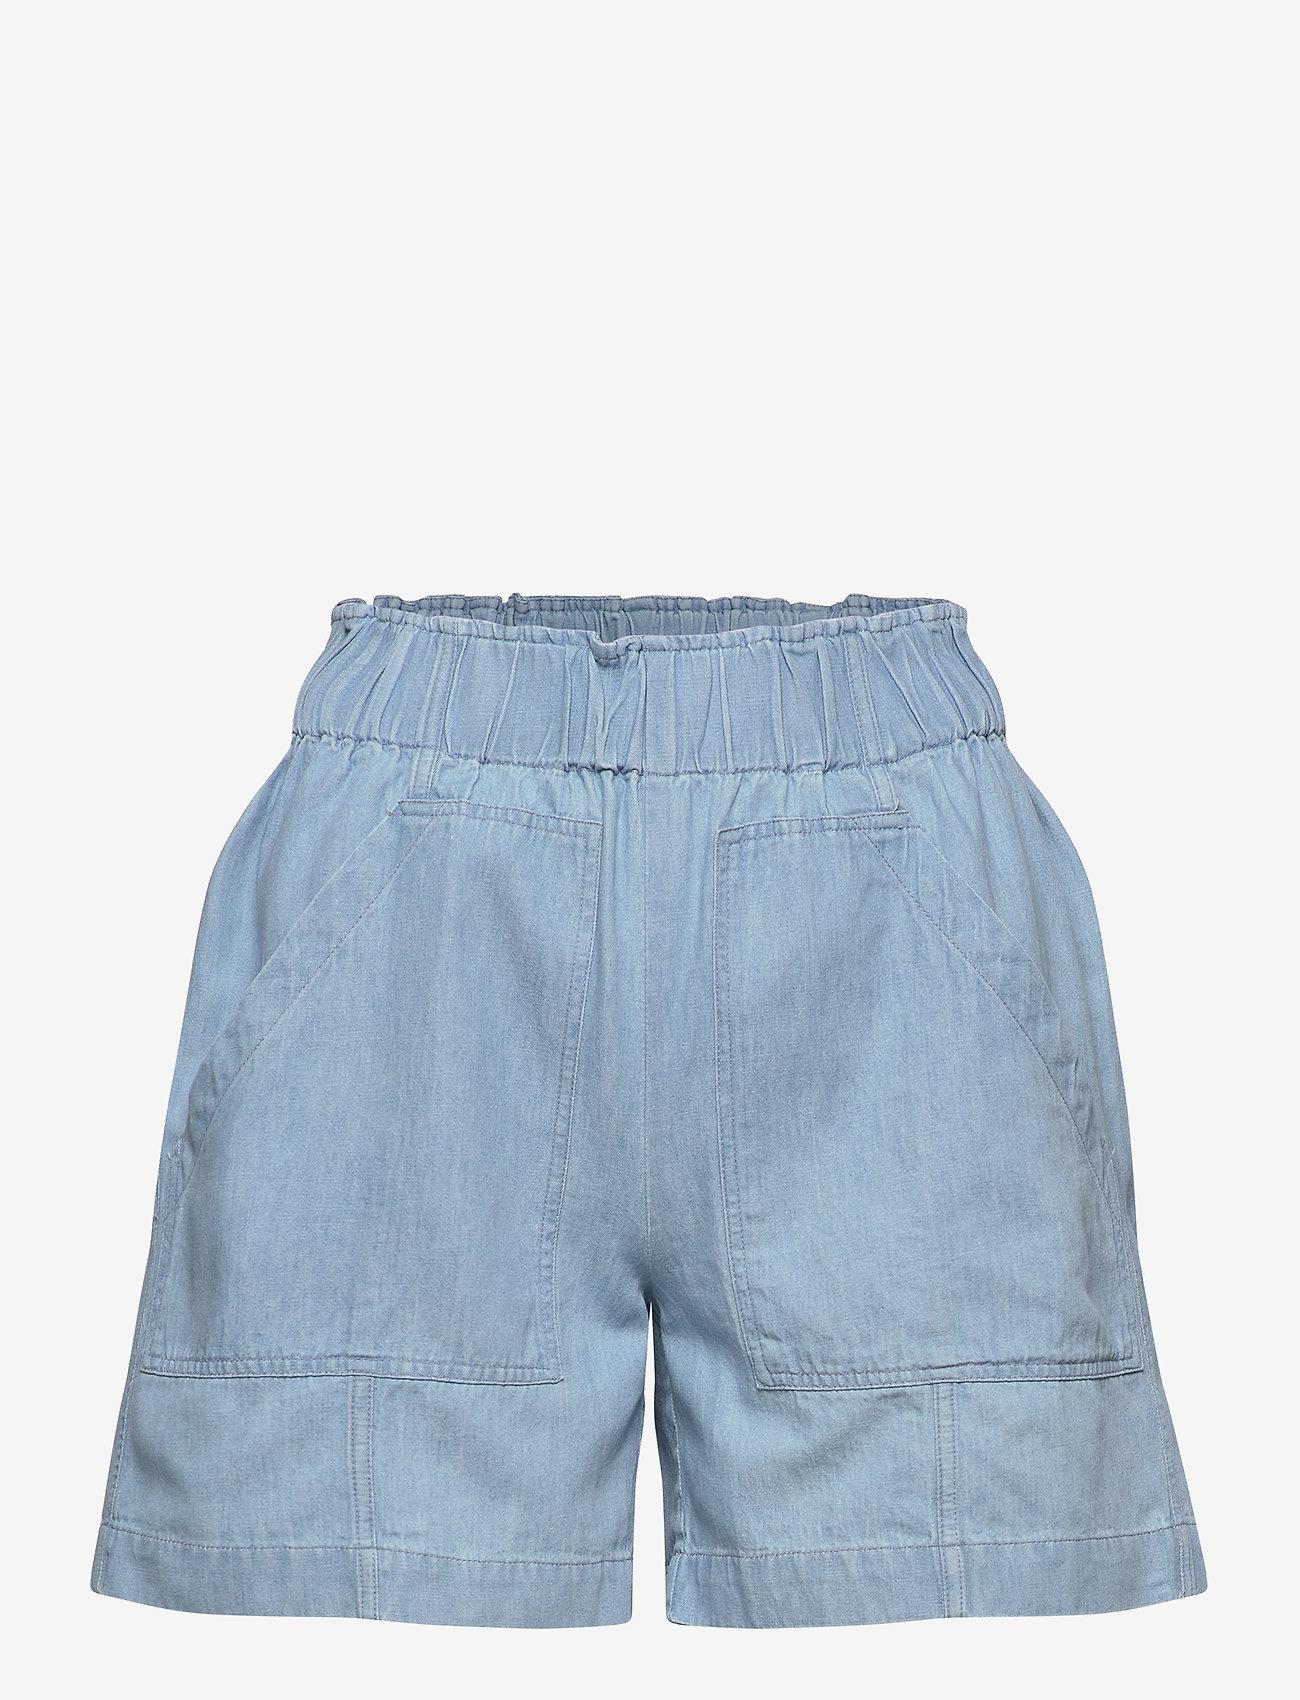 Selected Femme - SLFNOVO MW SHORTS W - korte jeansbroeken - light blue - 0